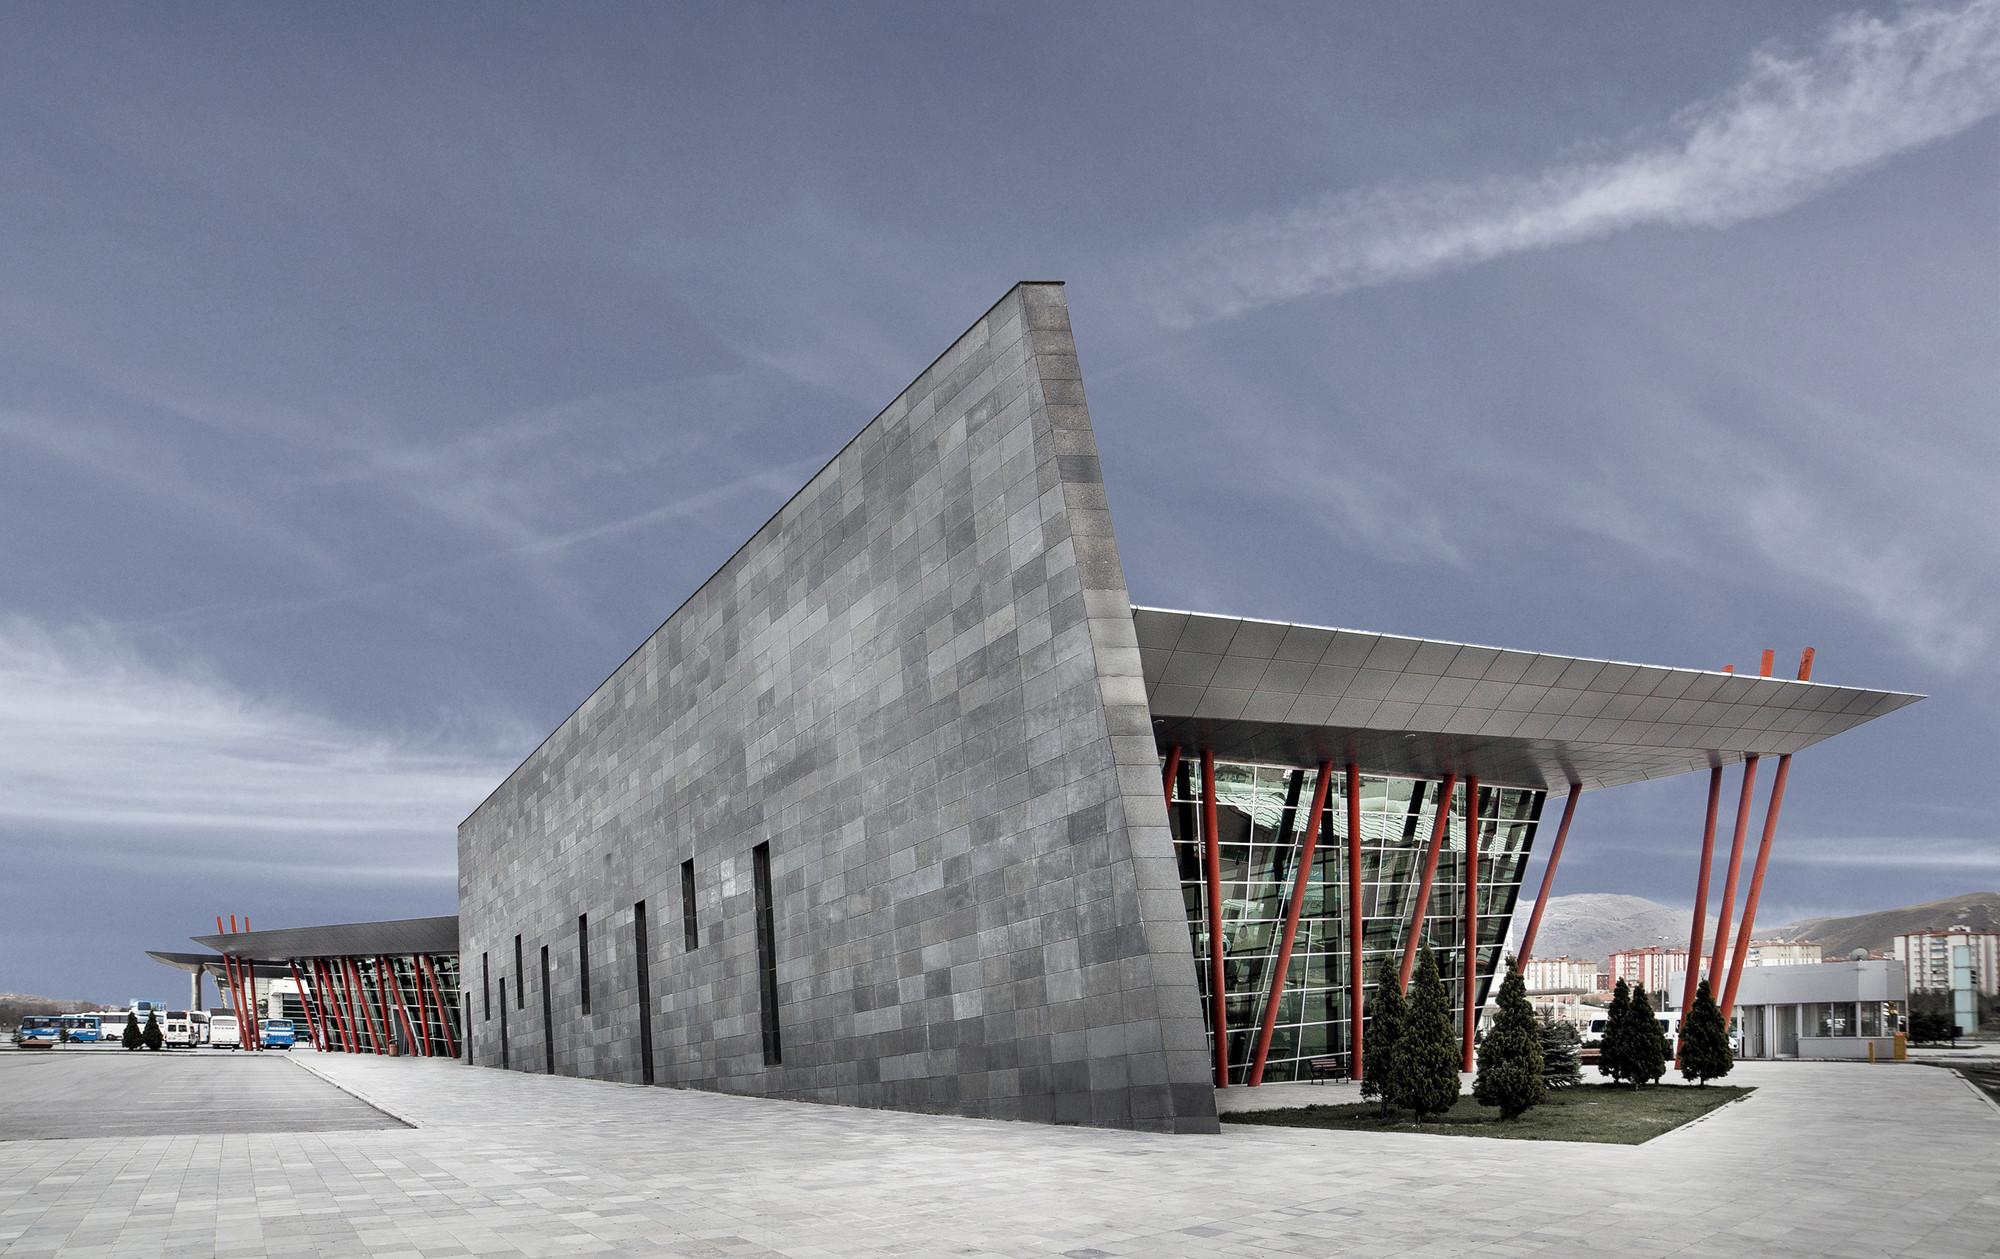 Kayseri West City Bus Terminal / Bahadir Kul Architects, © Ket Kolektif